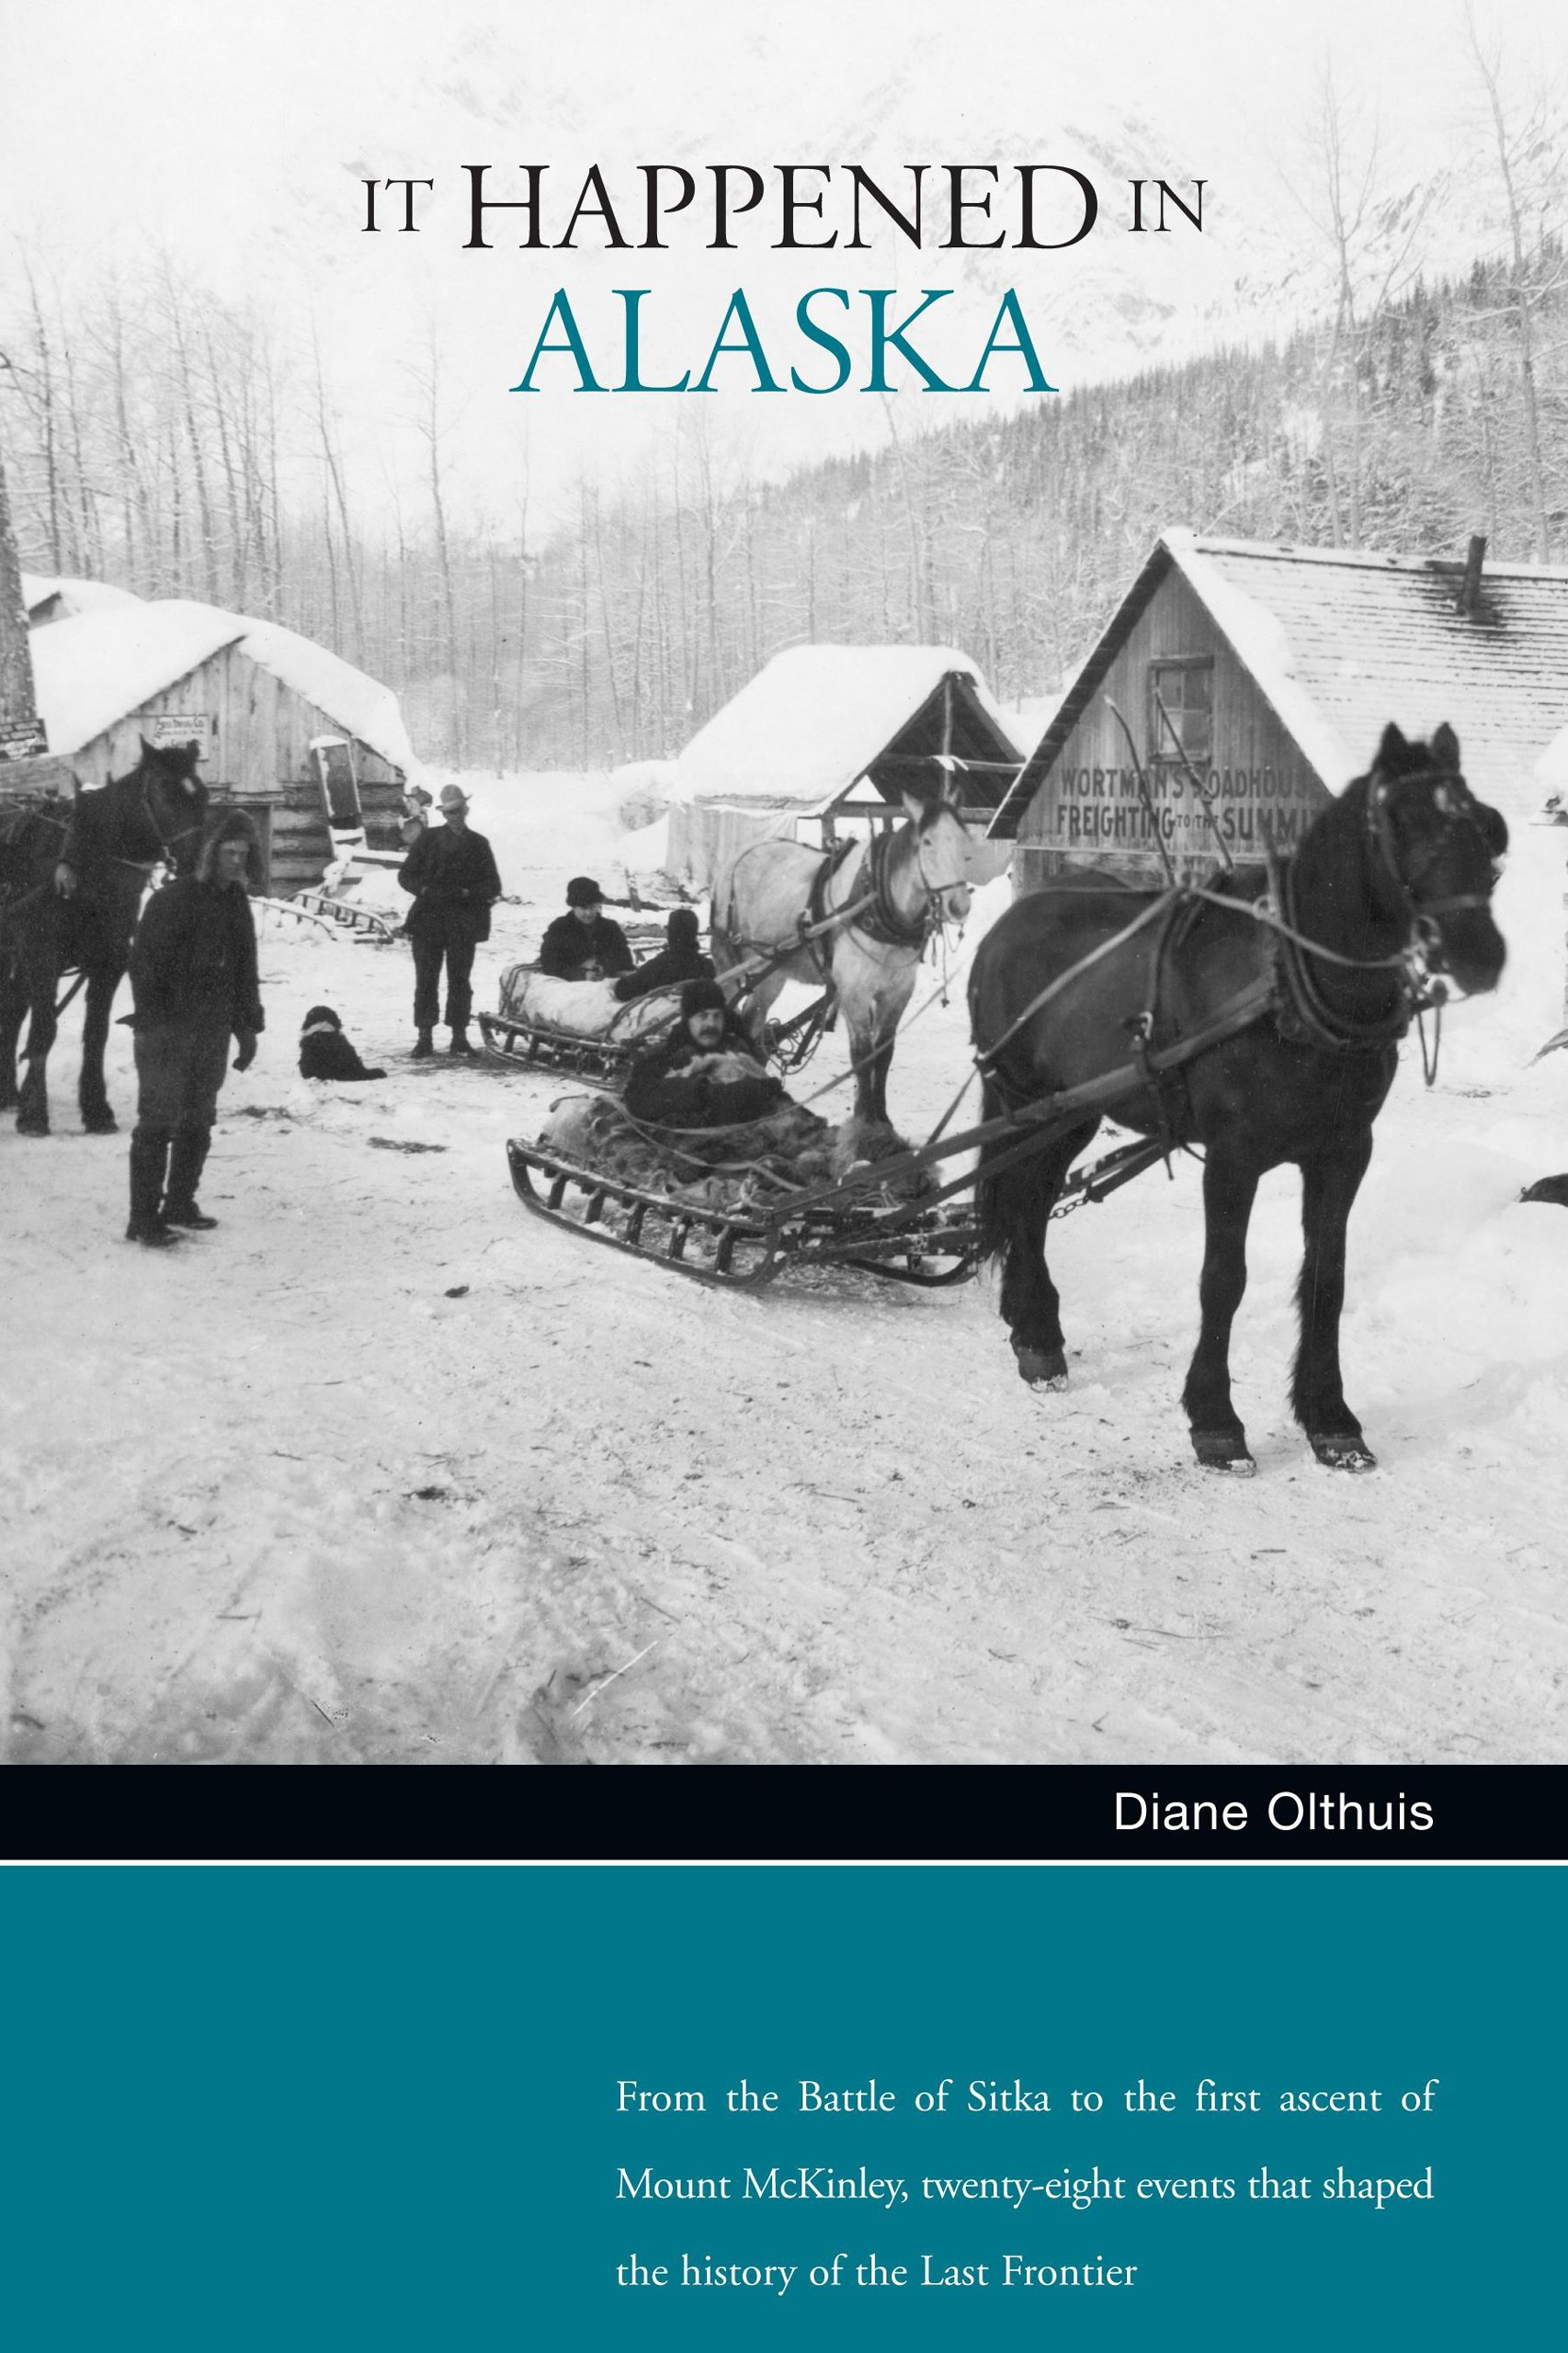 It Happened in Alaska (It Happened In Series) pdf